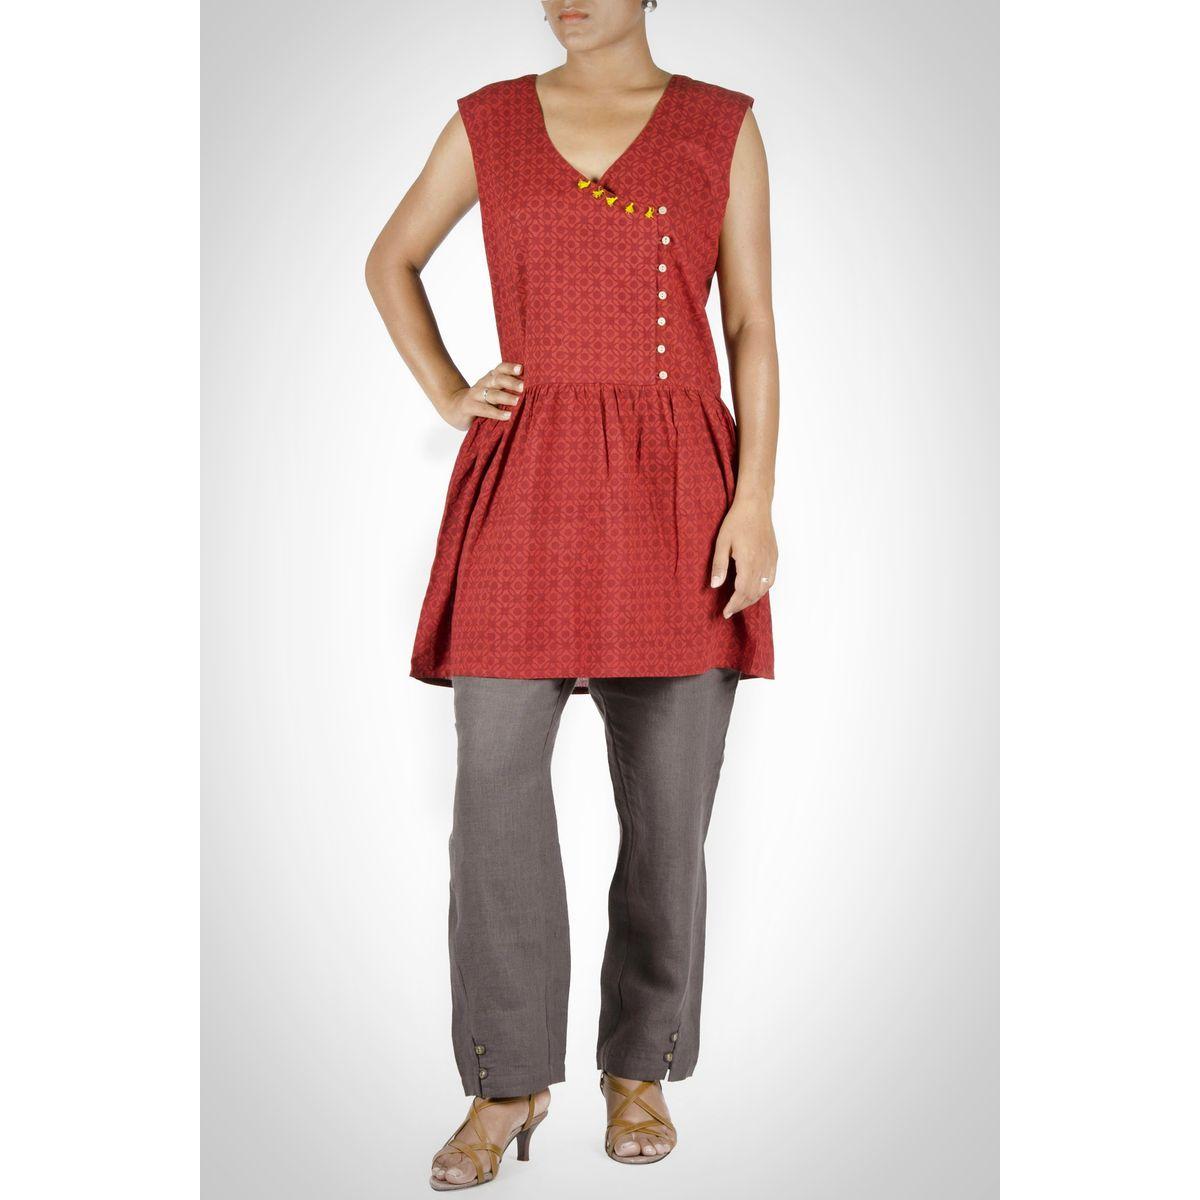 Red Cotton Sleeveless Tunic